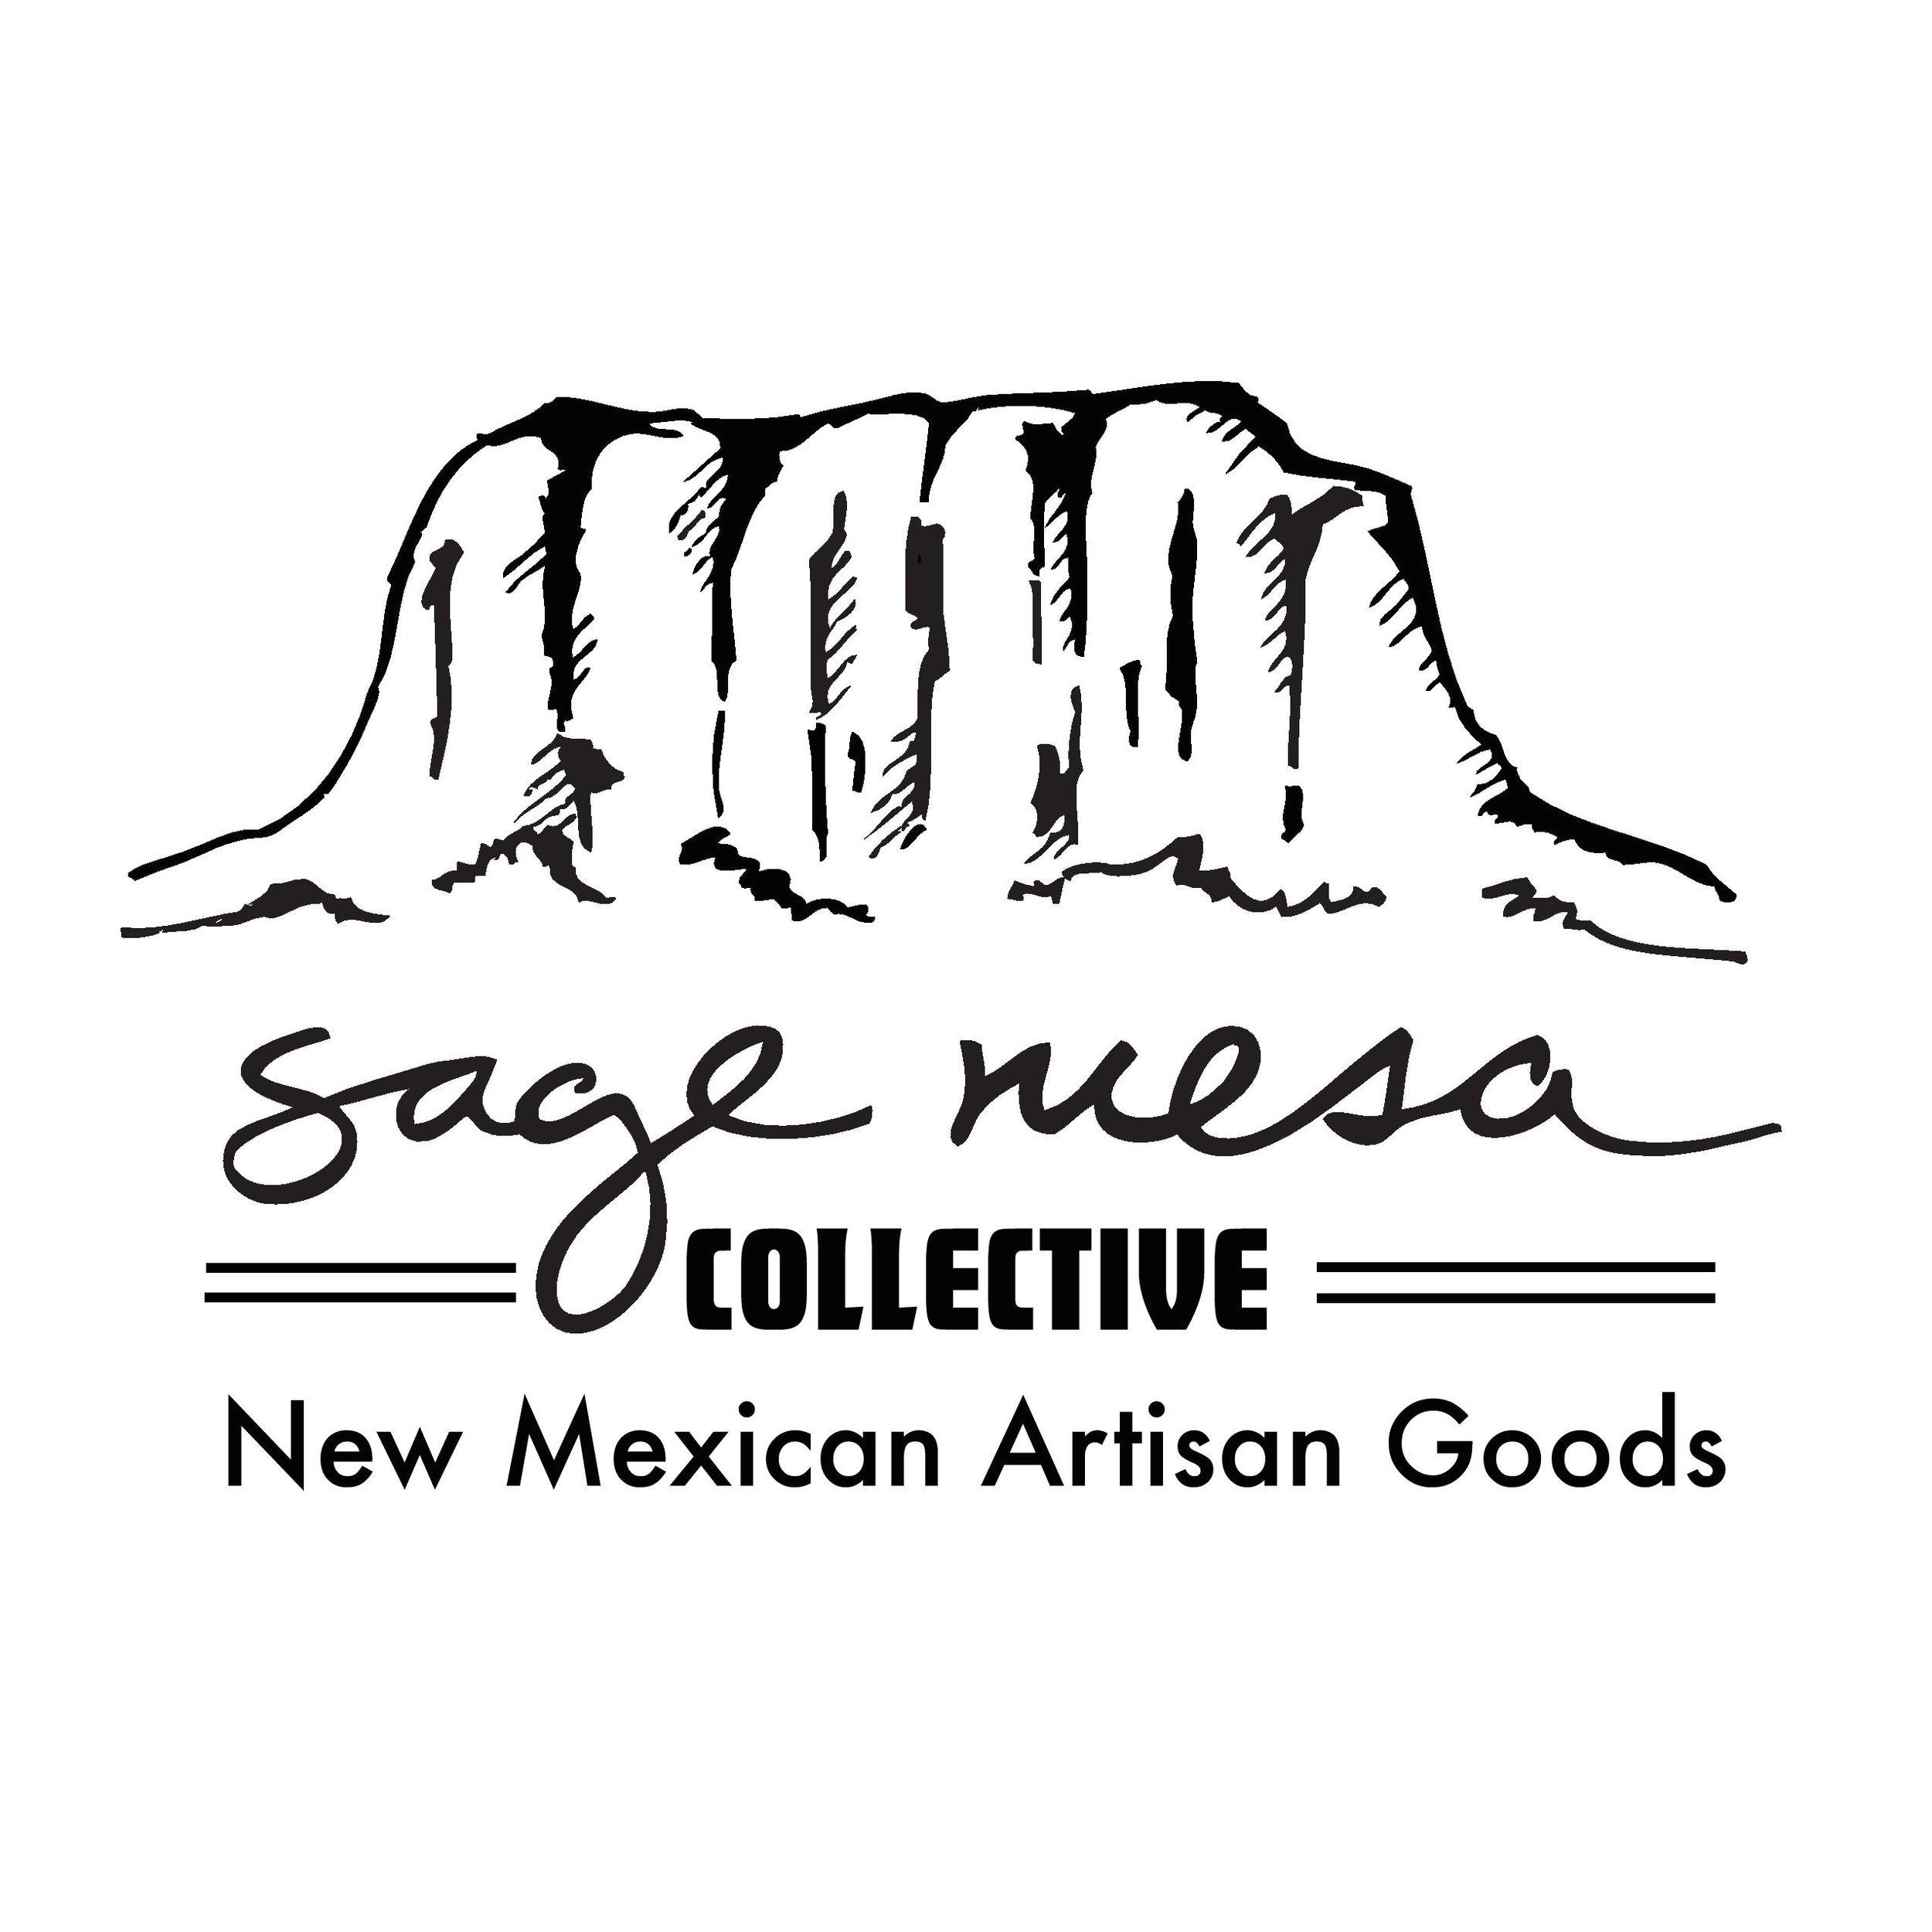 Amanda  Sweeney - sage mesa collective-image 1-header.jpg